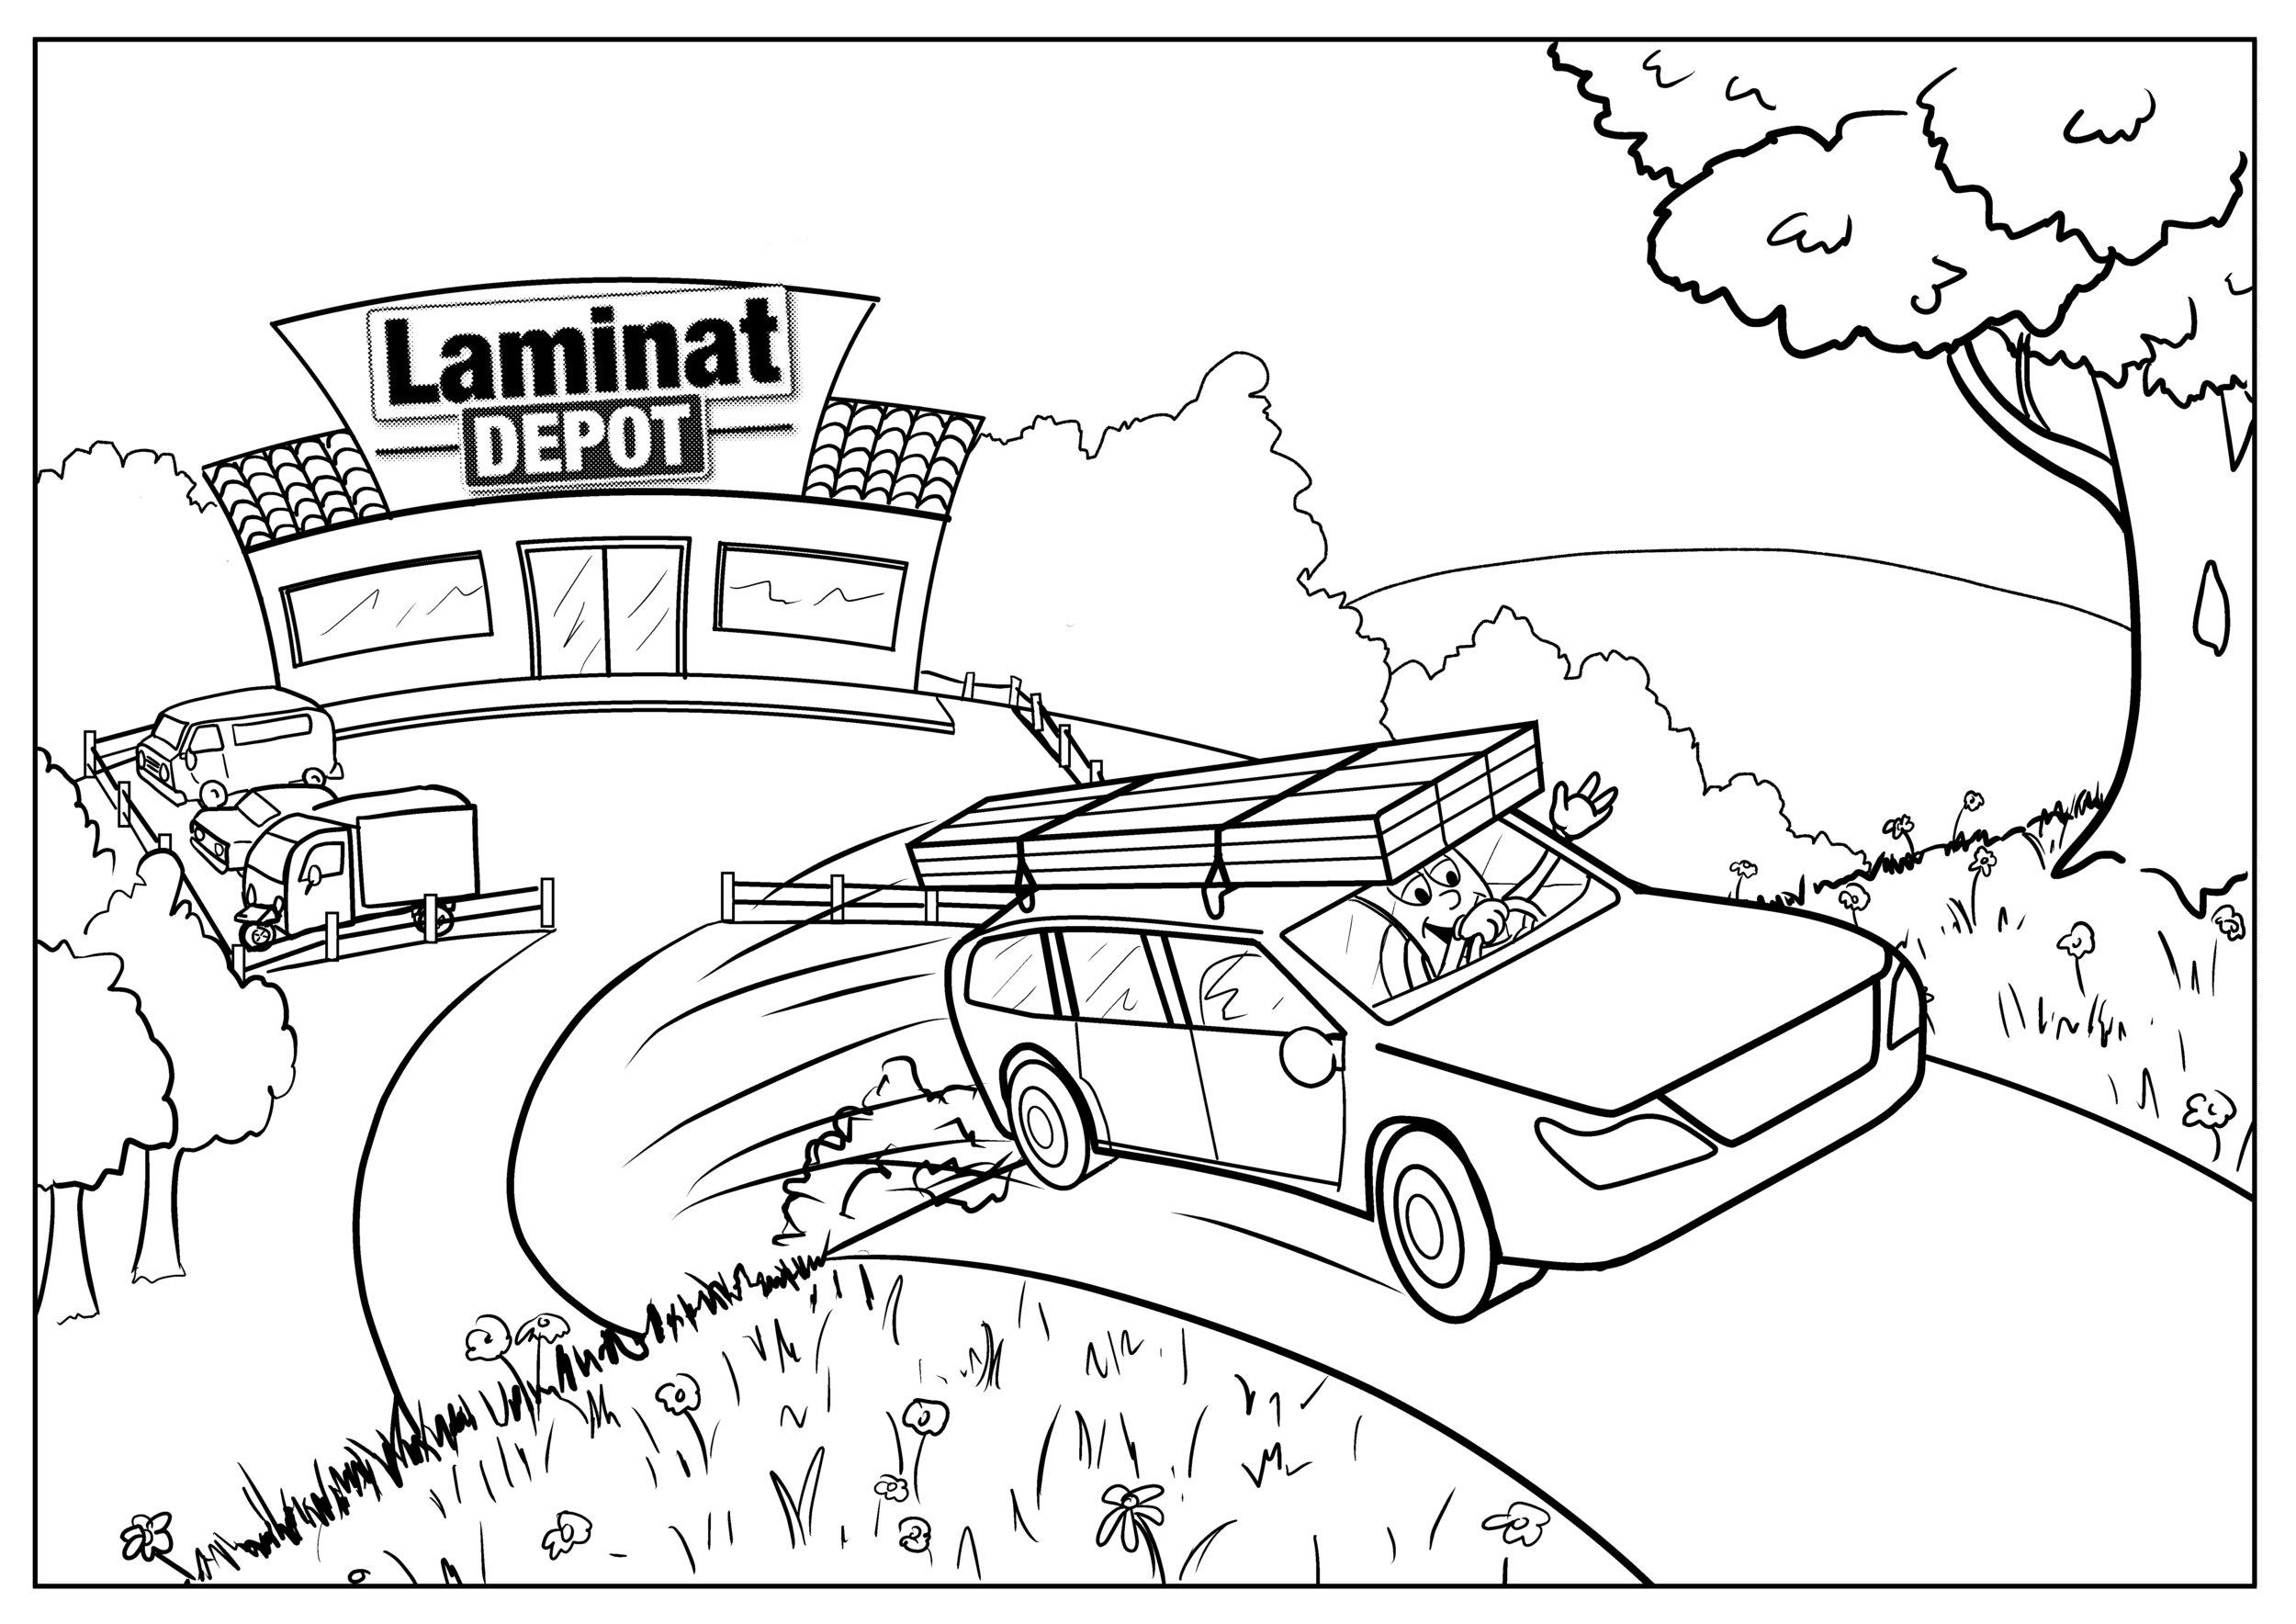 Laminat Depot Coloring Book Interior